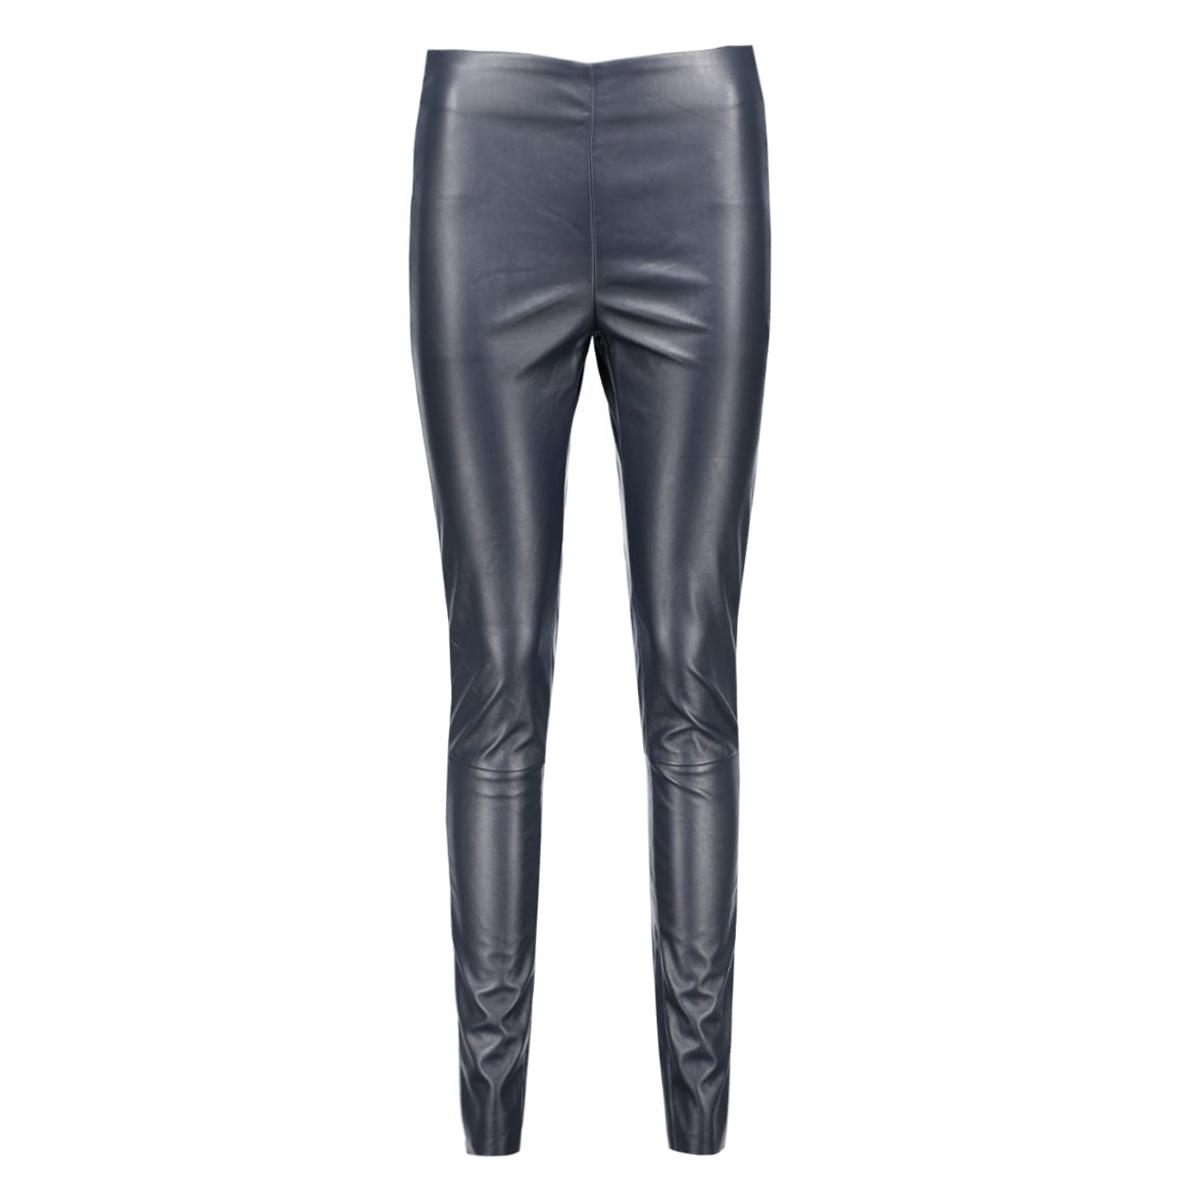 16wi050 10 days legging black/blue